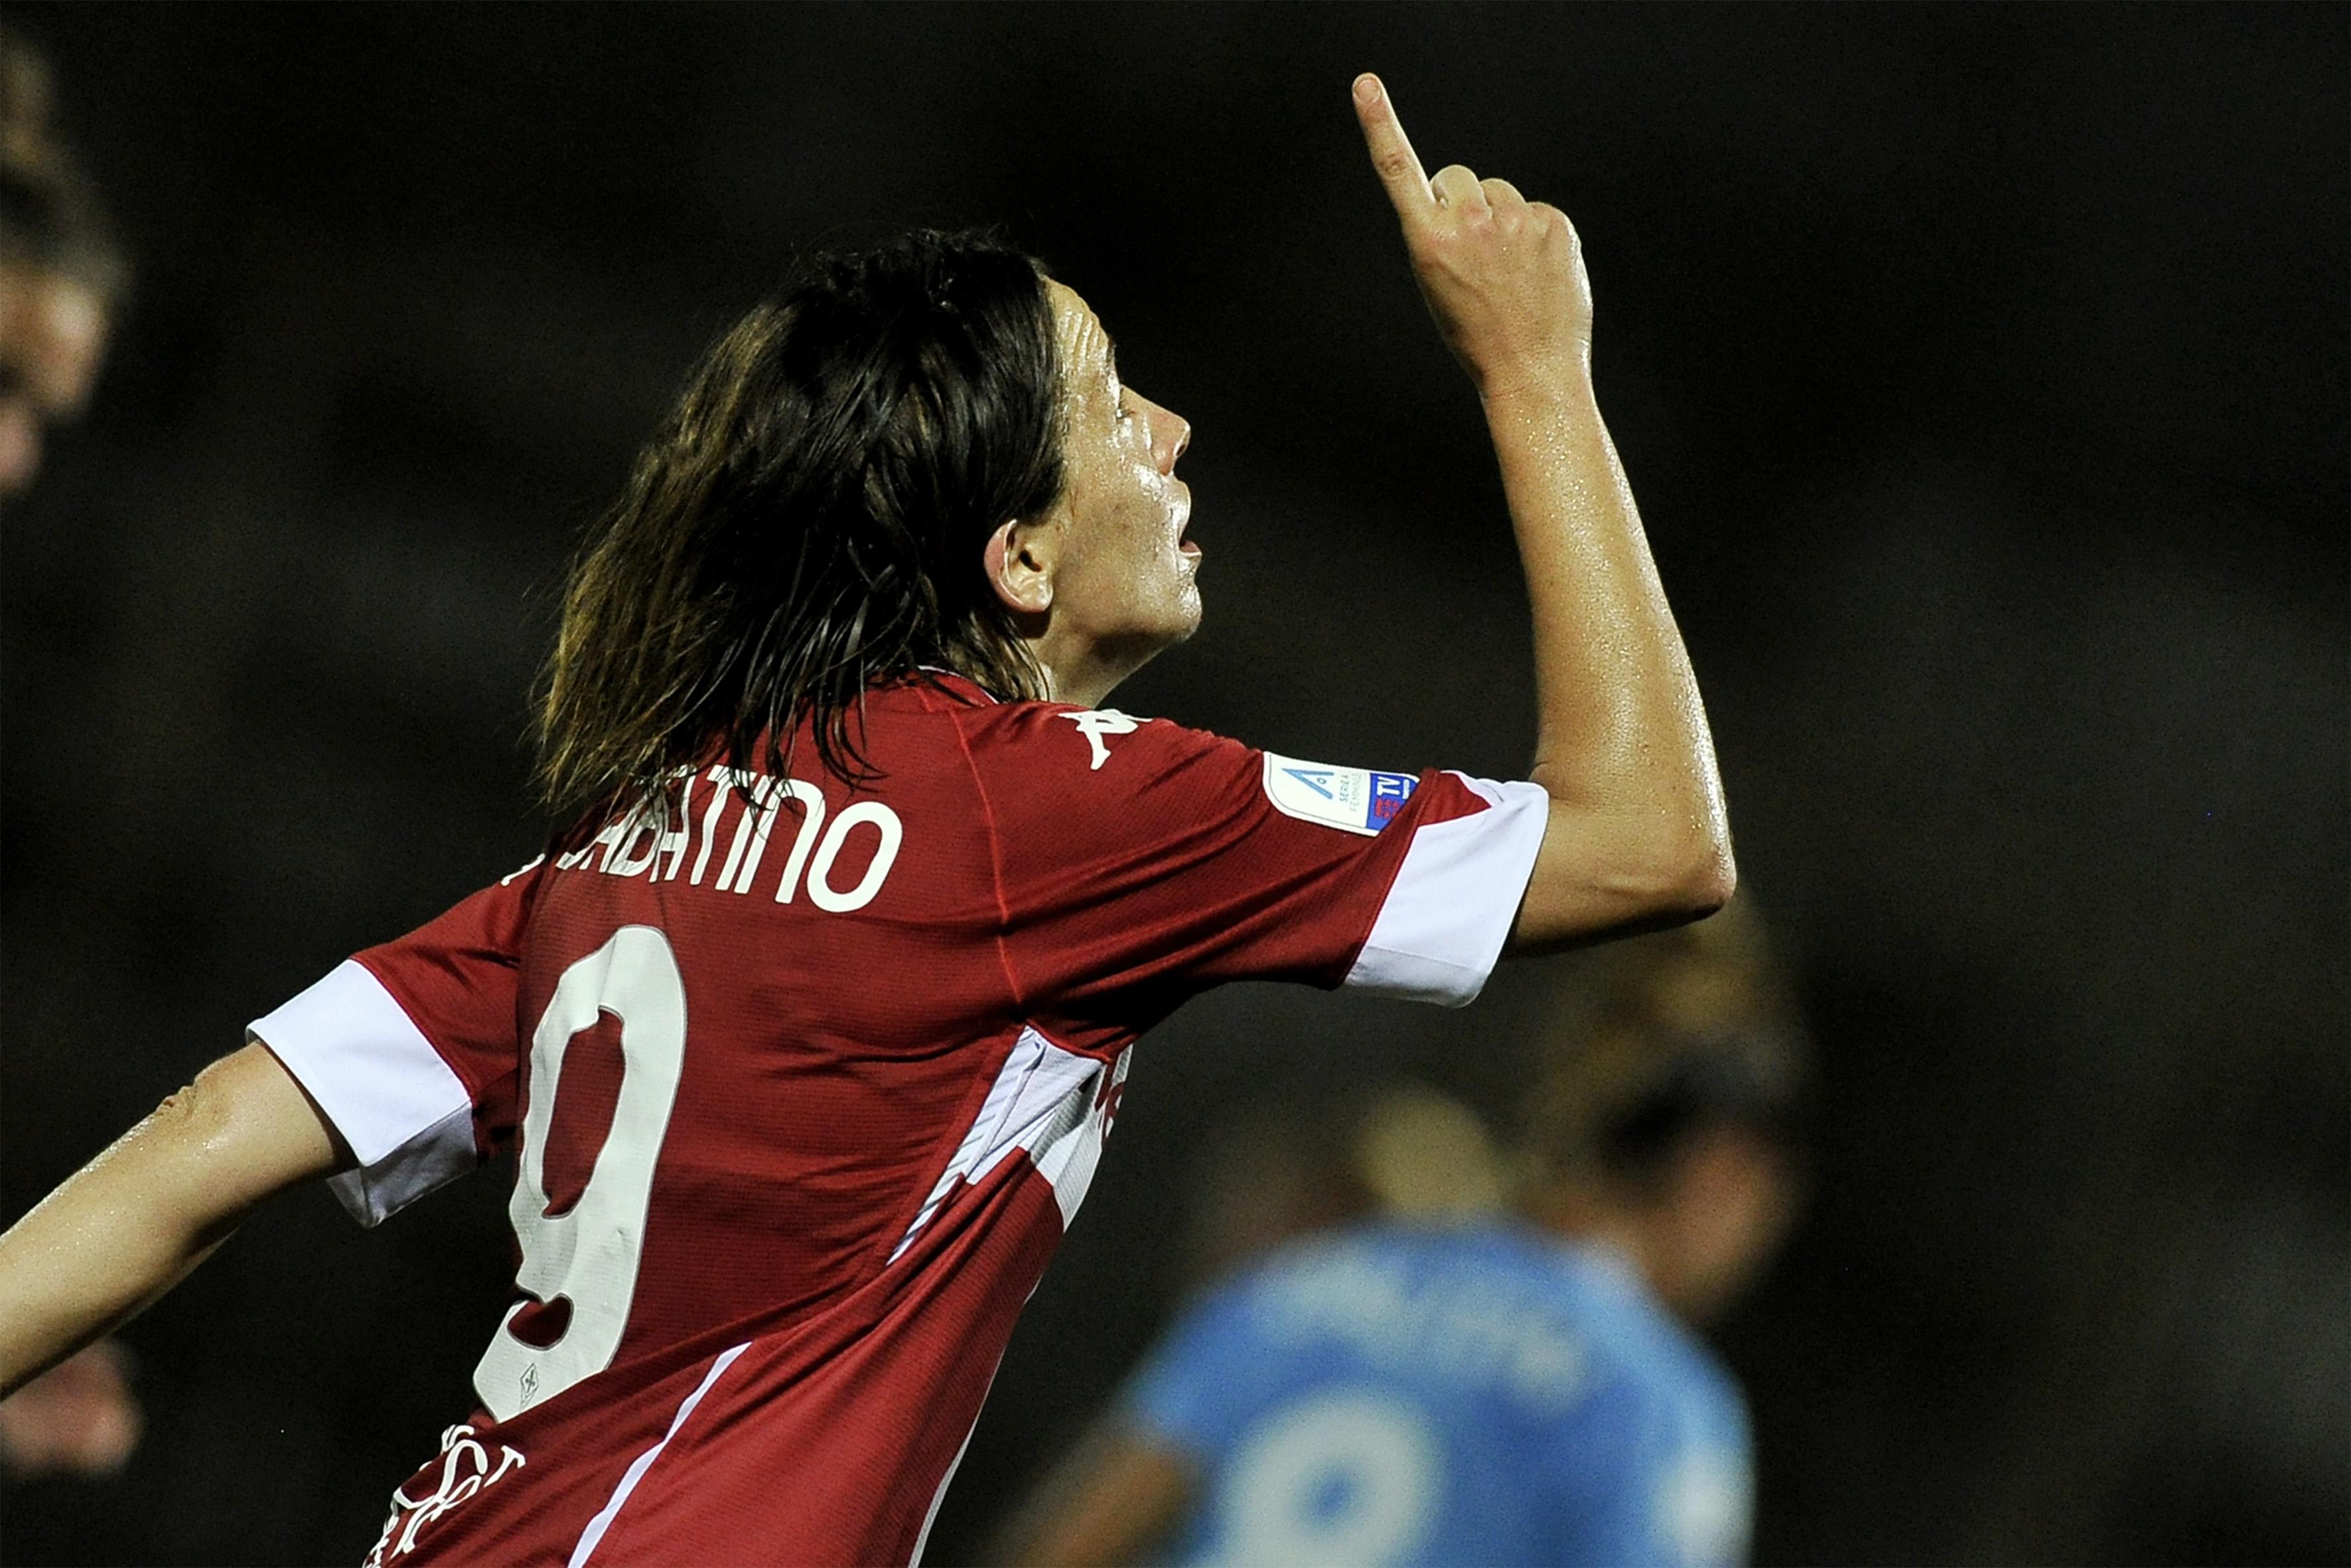 Daniela Sabatino player of Fiorentina, during the match of...